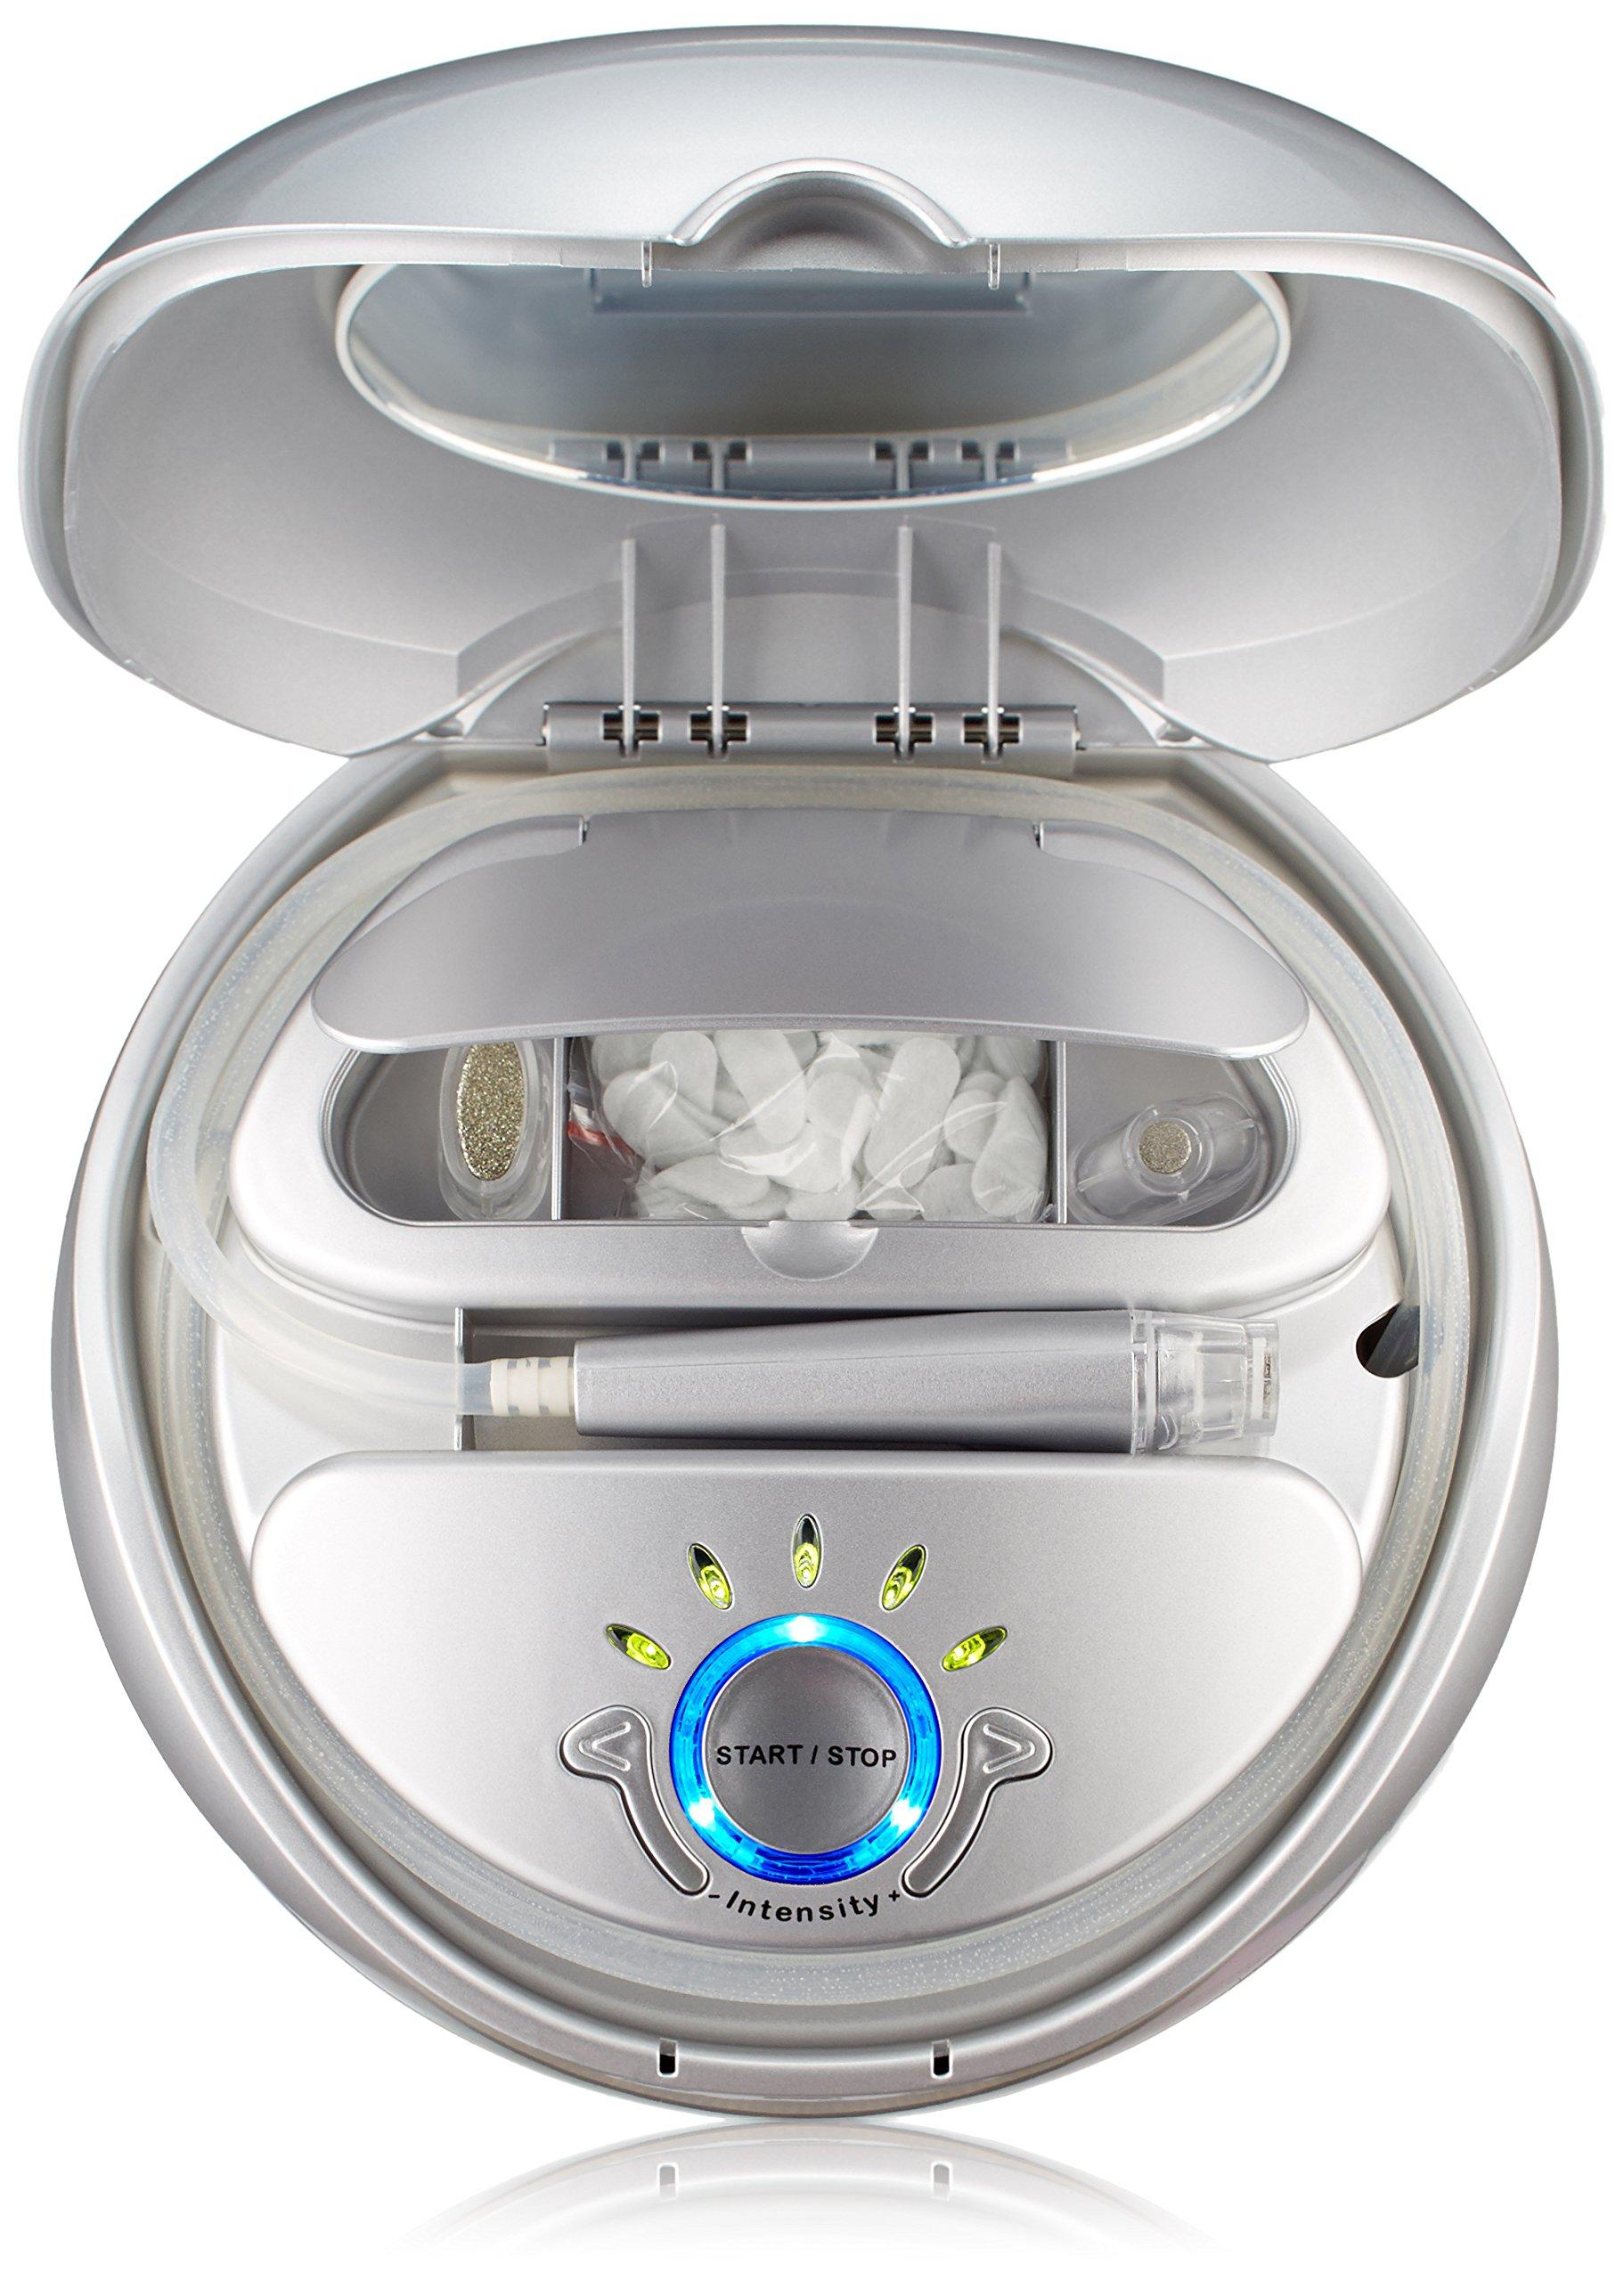 NuBrilliance Microdermabrasion Skin Care System, White